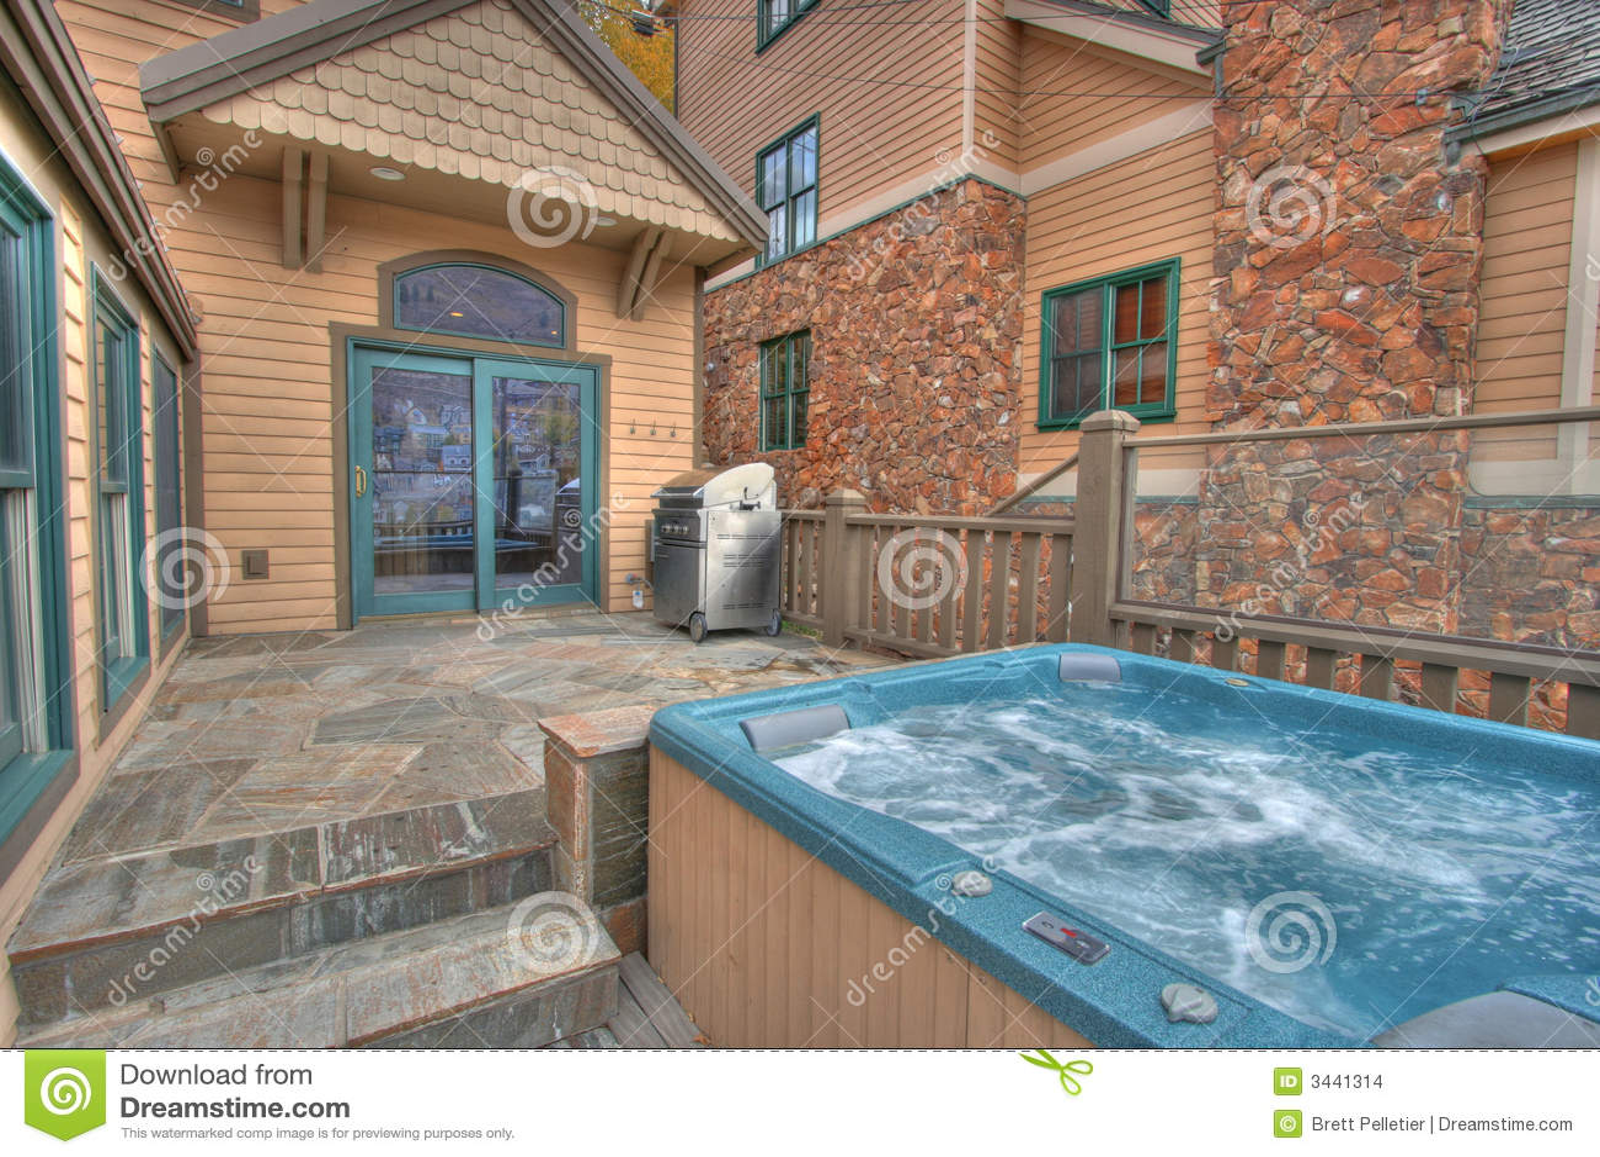 Jacuzzi En El Patio.Back Patio And Hot Tub Stock Photo Image Of Jacuzzi Rental